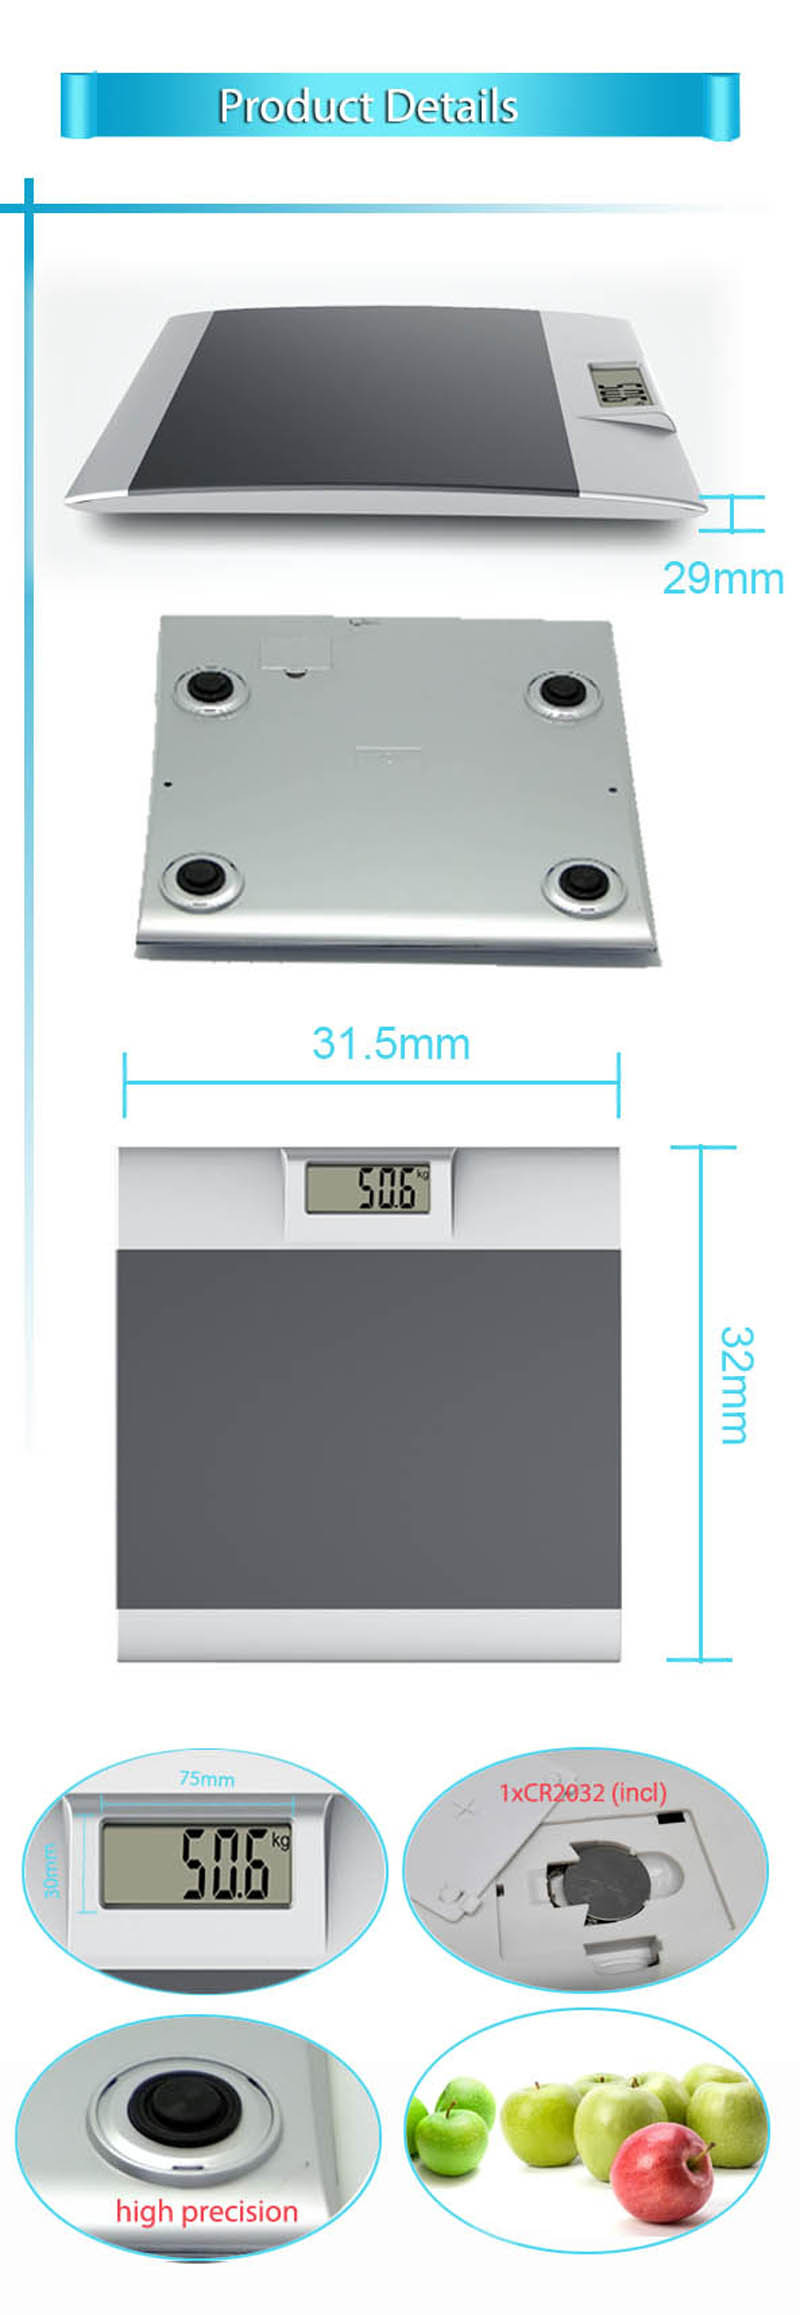 Sunny Precision Calibrate Digital Bathroom Scale Buy